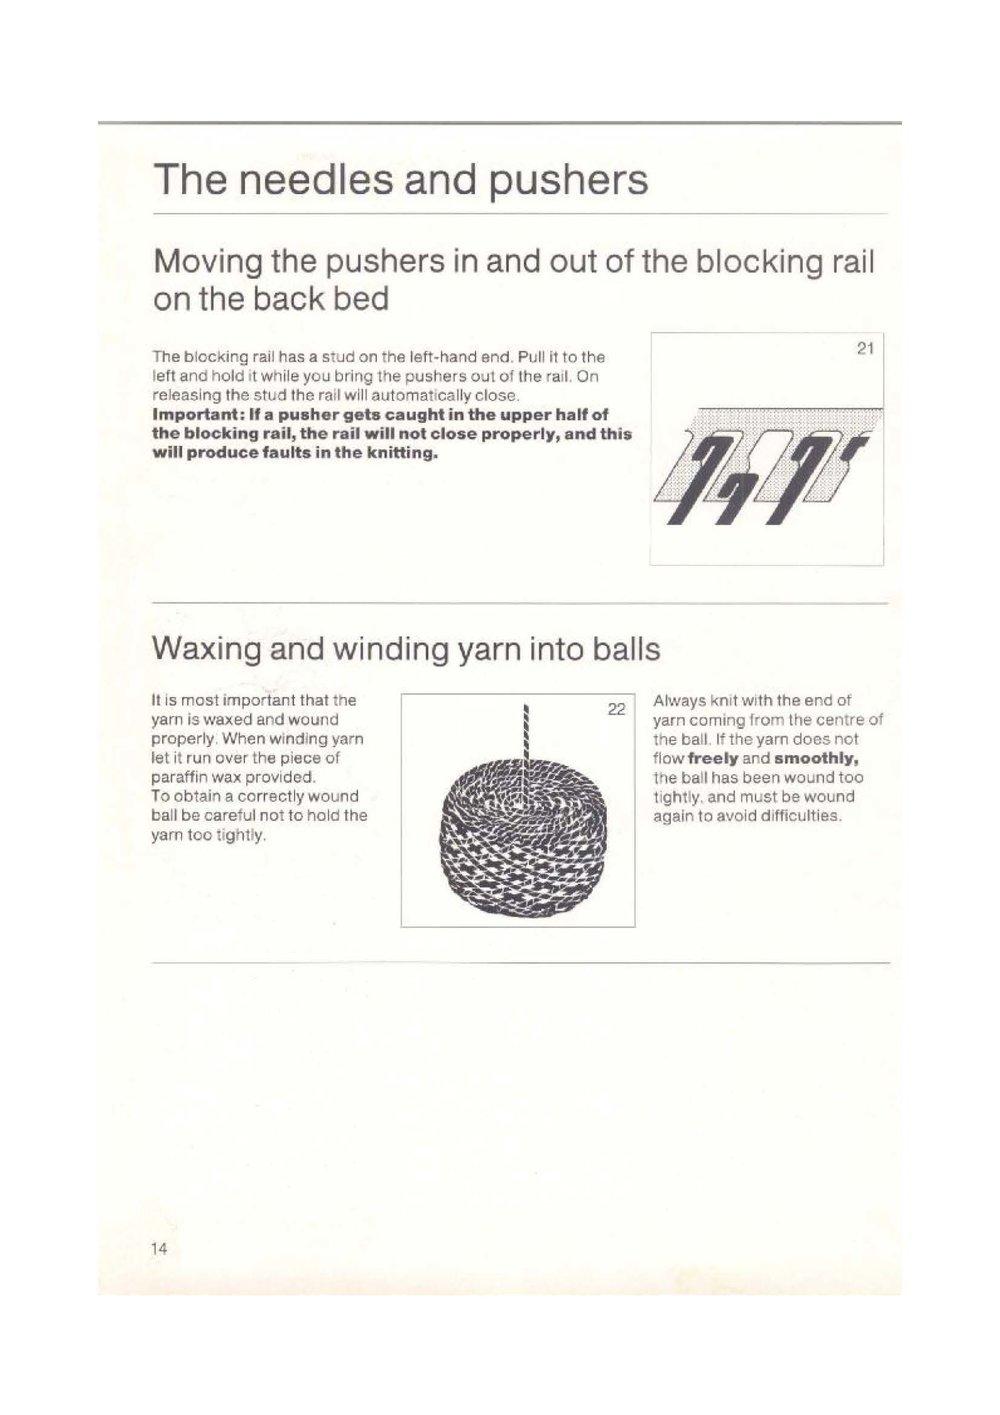 passap_e6000_instruction_manual (100)_Page_015.jpg